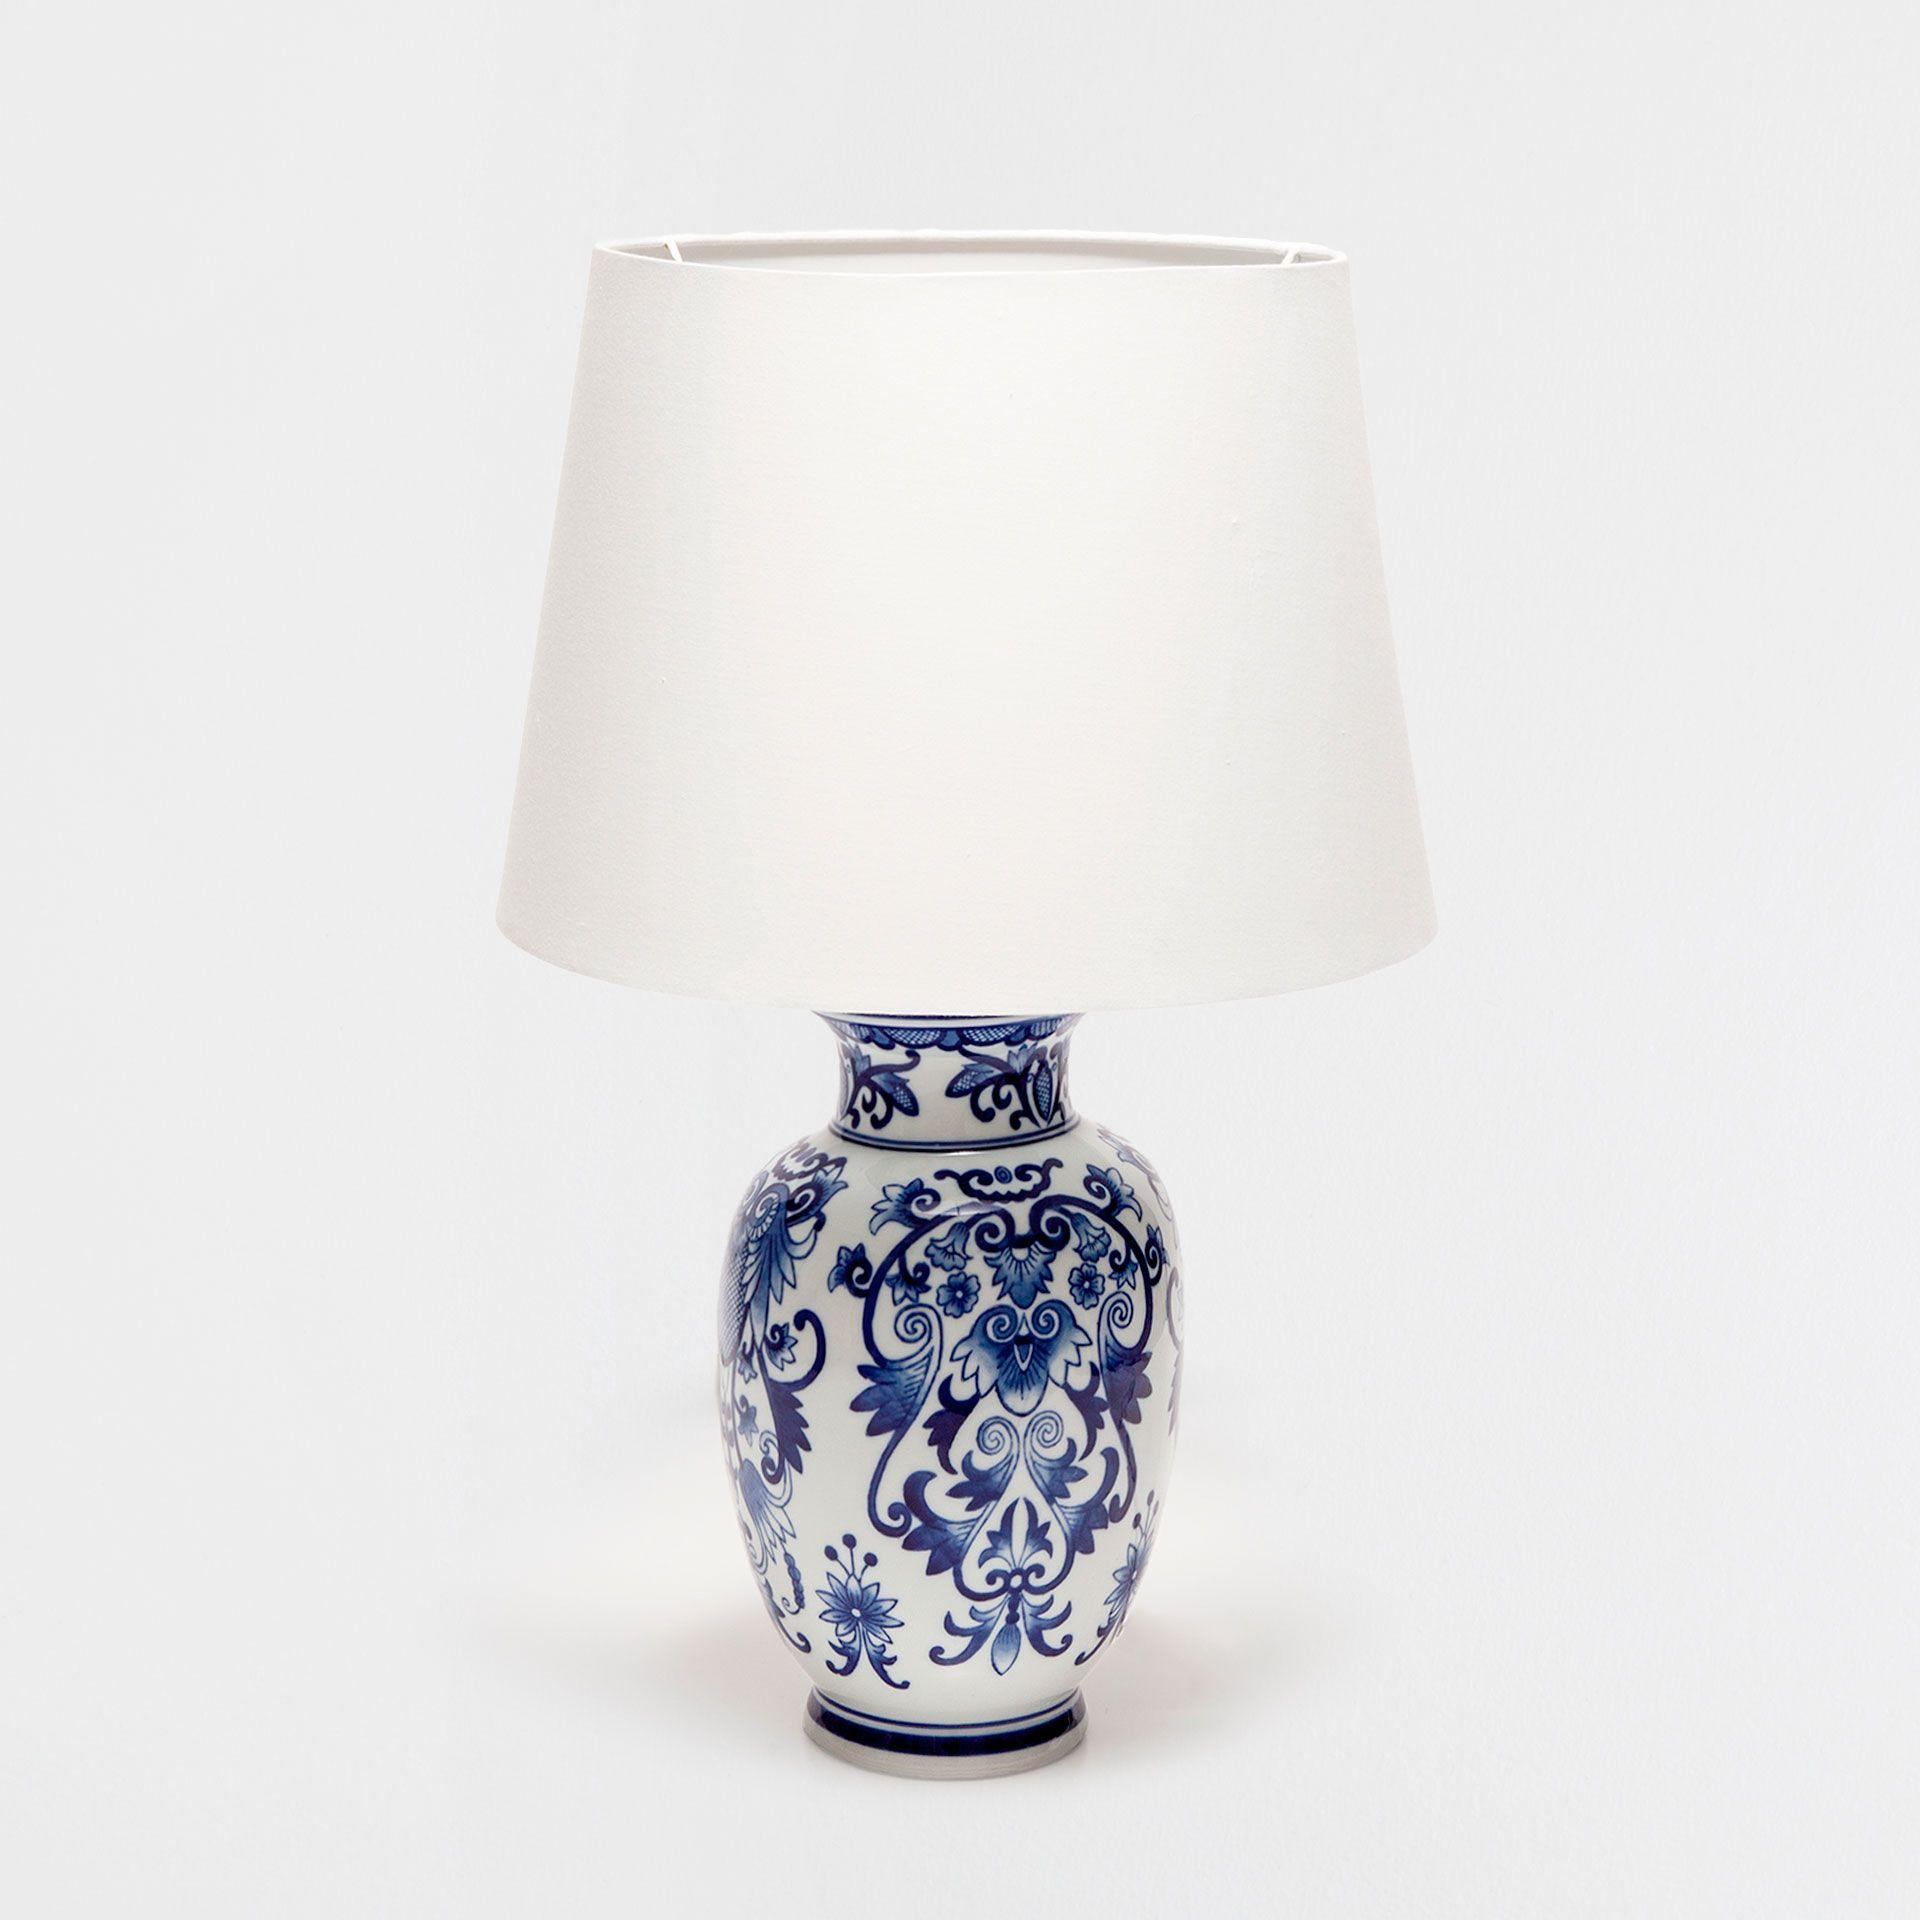 Lampara Ceramica Pintada A Mano Lamparas Decoracion Zara Home Mexico Ceramic Lamp Lamp Decor Lamp